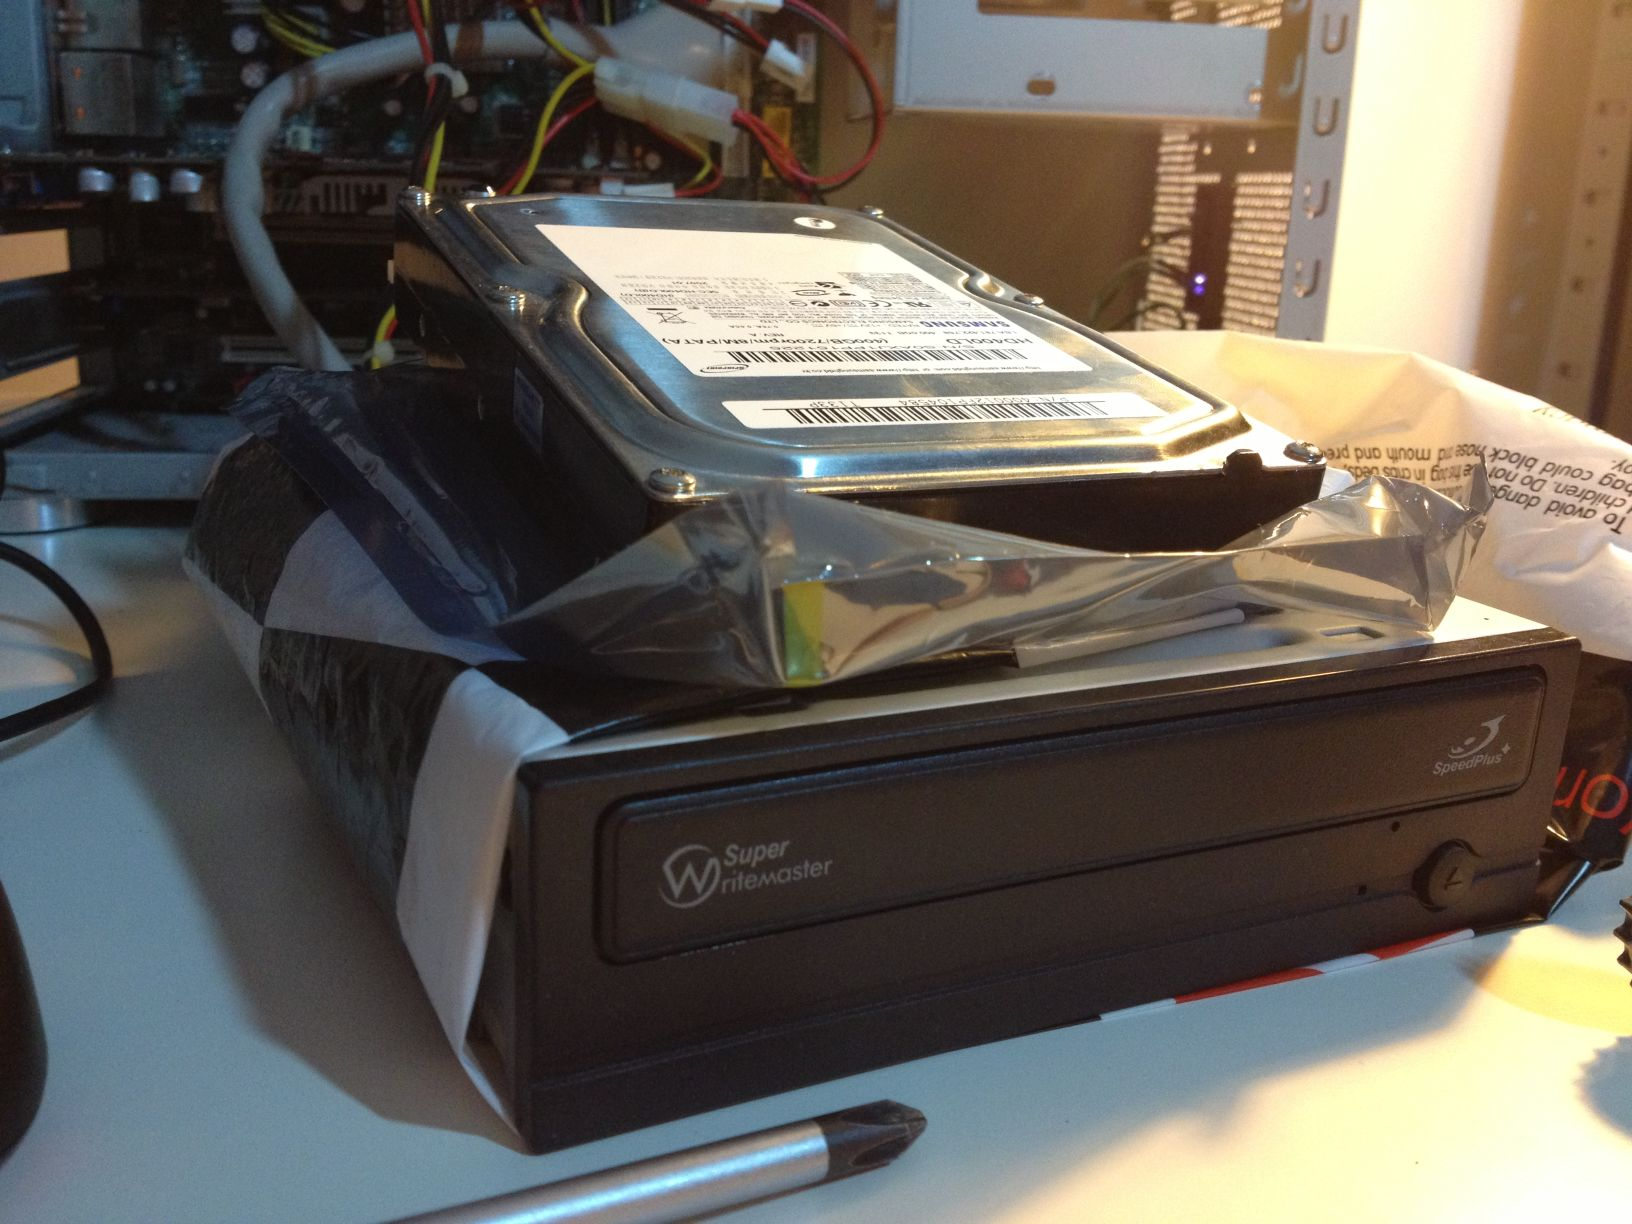 [TAGEBUCH] Quick & Dirty : Keller-Retro PC Tagebuch *Von wegen abgeschlossen* Chieftec CS 601 ;-)-image003.jpg